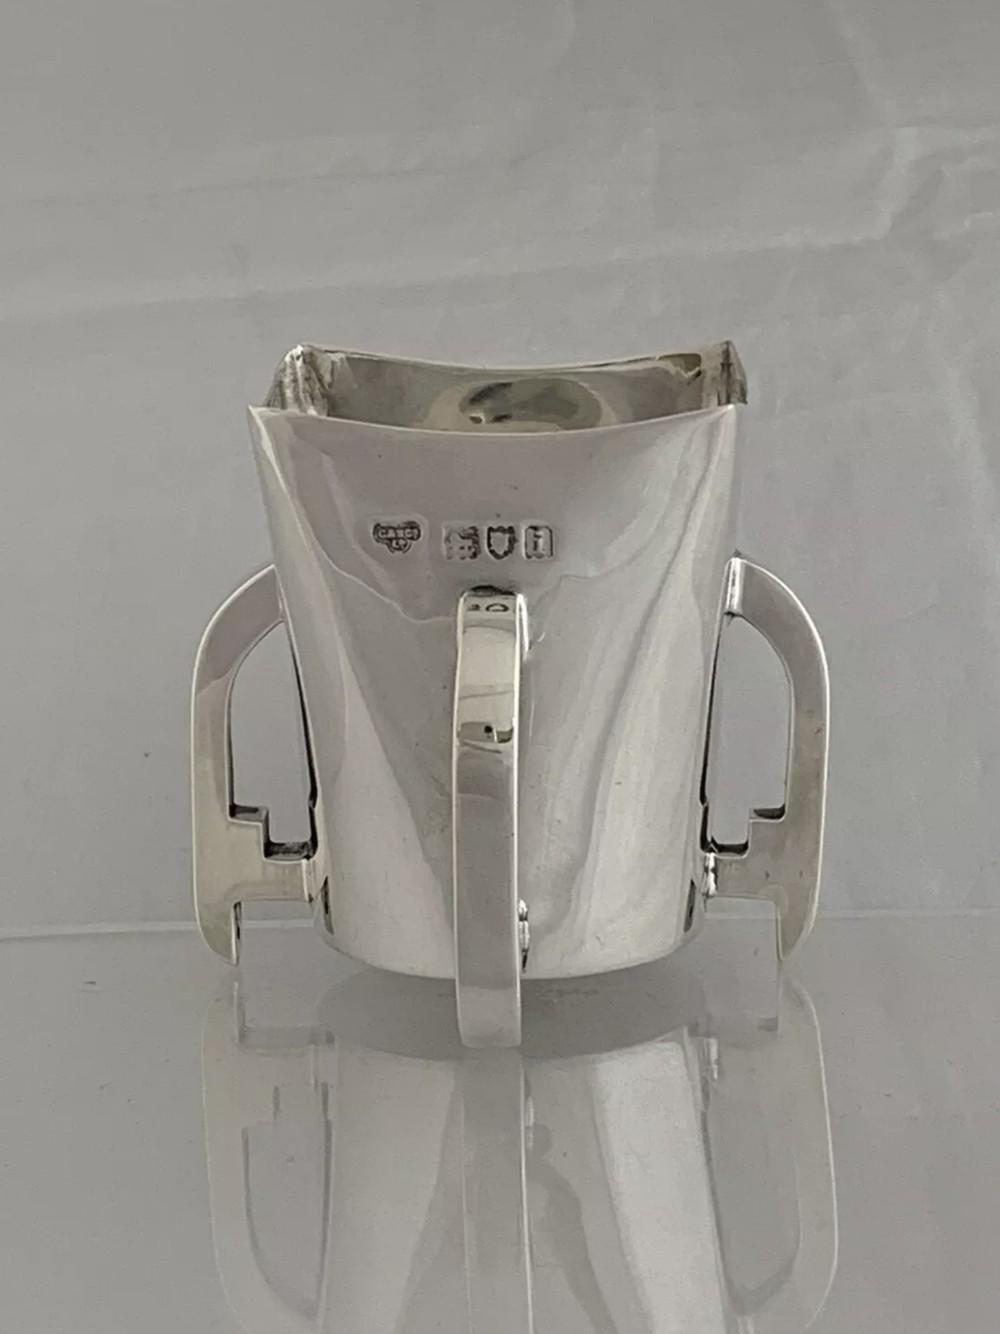 edwardian antique silver beaker 4 handled loving cup 1904 london sterling silver